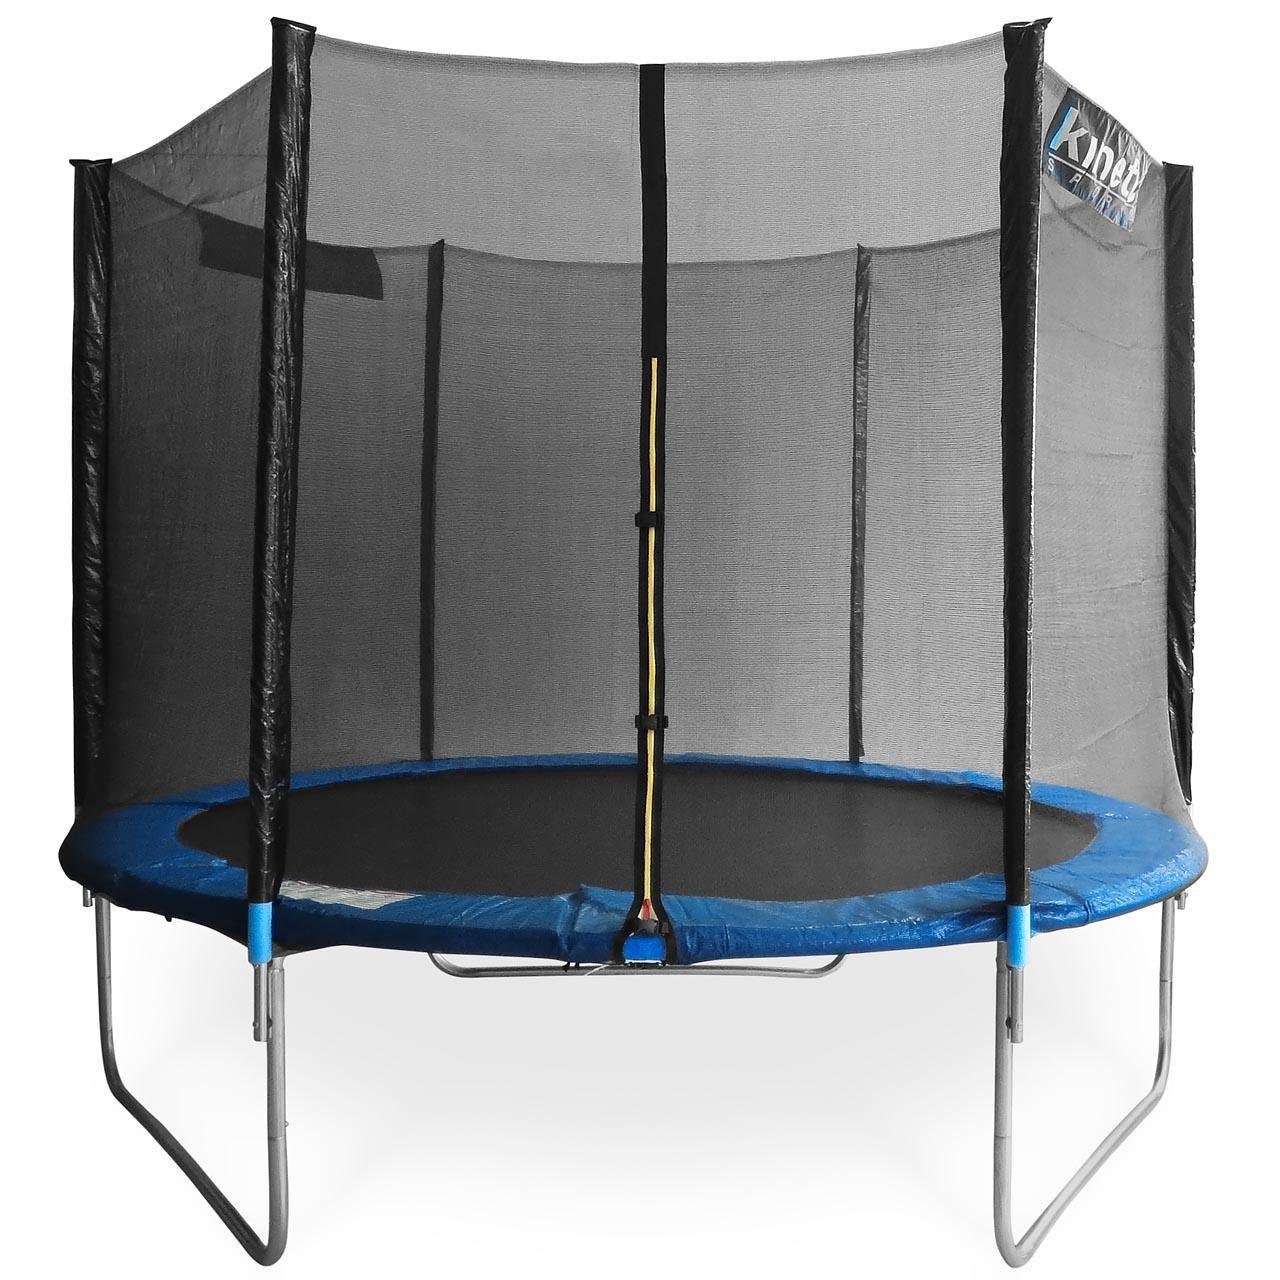 Kinetic Sports Gartentrampolin inkl. Sicherheitsnetz 183 bis 490cm Größenauswahl – Intertek GS zertifiziert bestellen